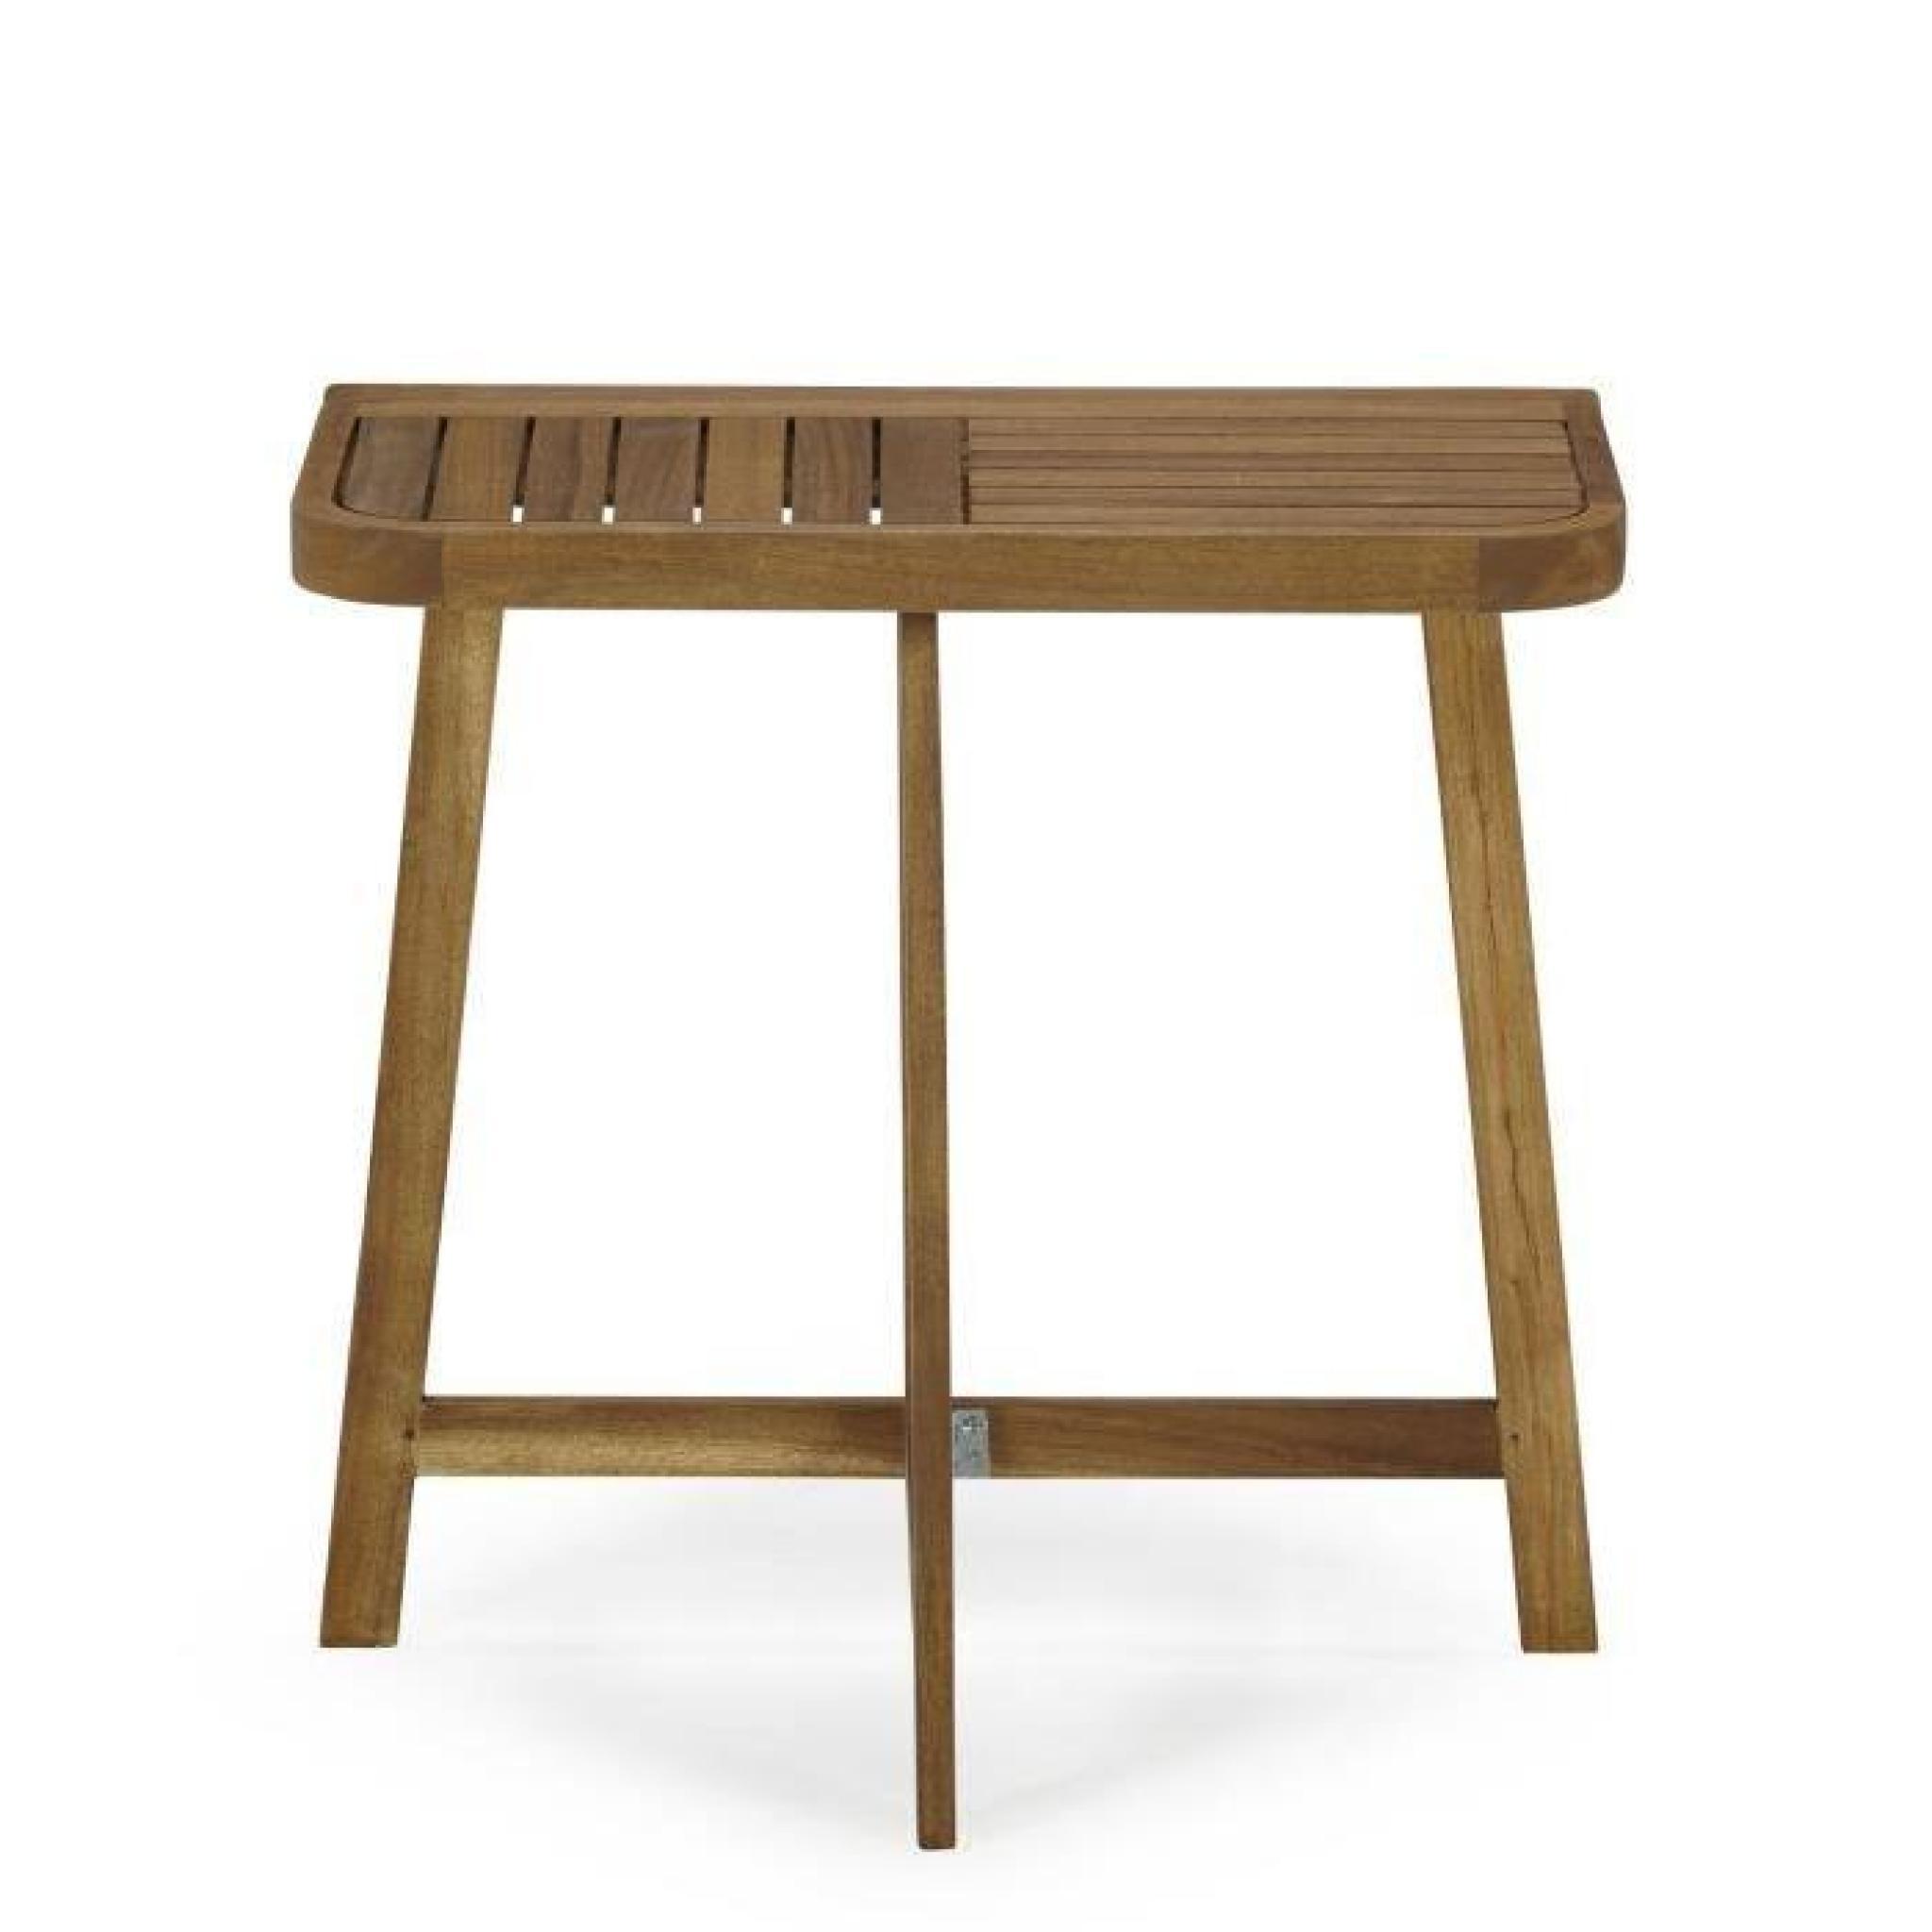 Youk Demi Table Pliante Pour Balcon Acacia Huile Achat Vente Table